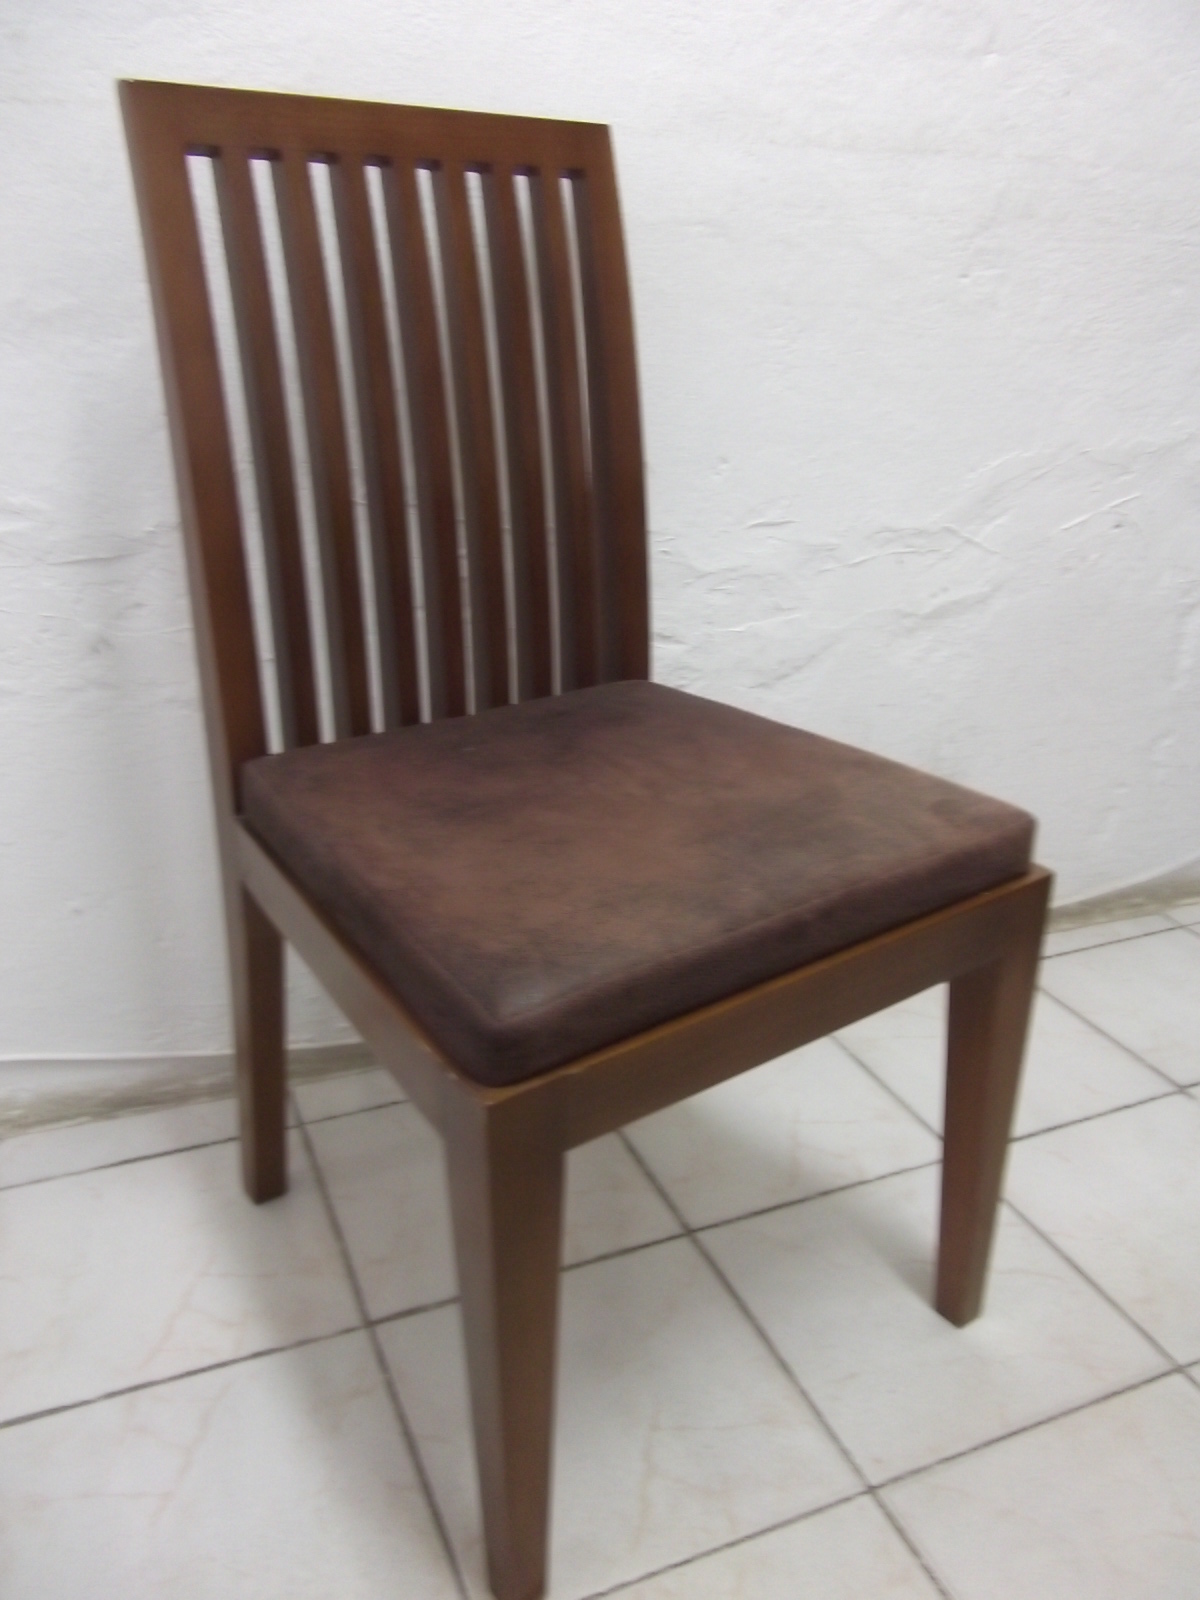 Cadeira e Mesa: Cadeiras de Madeira a Venda #432F28 1200x1600